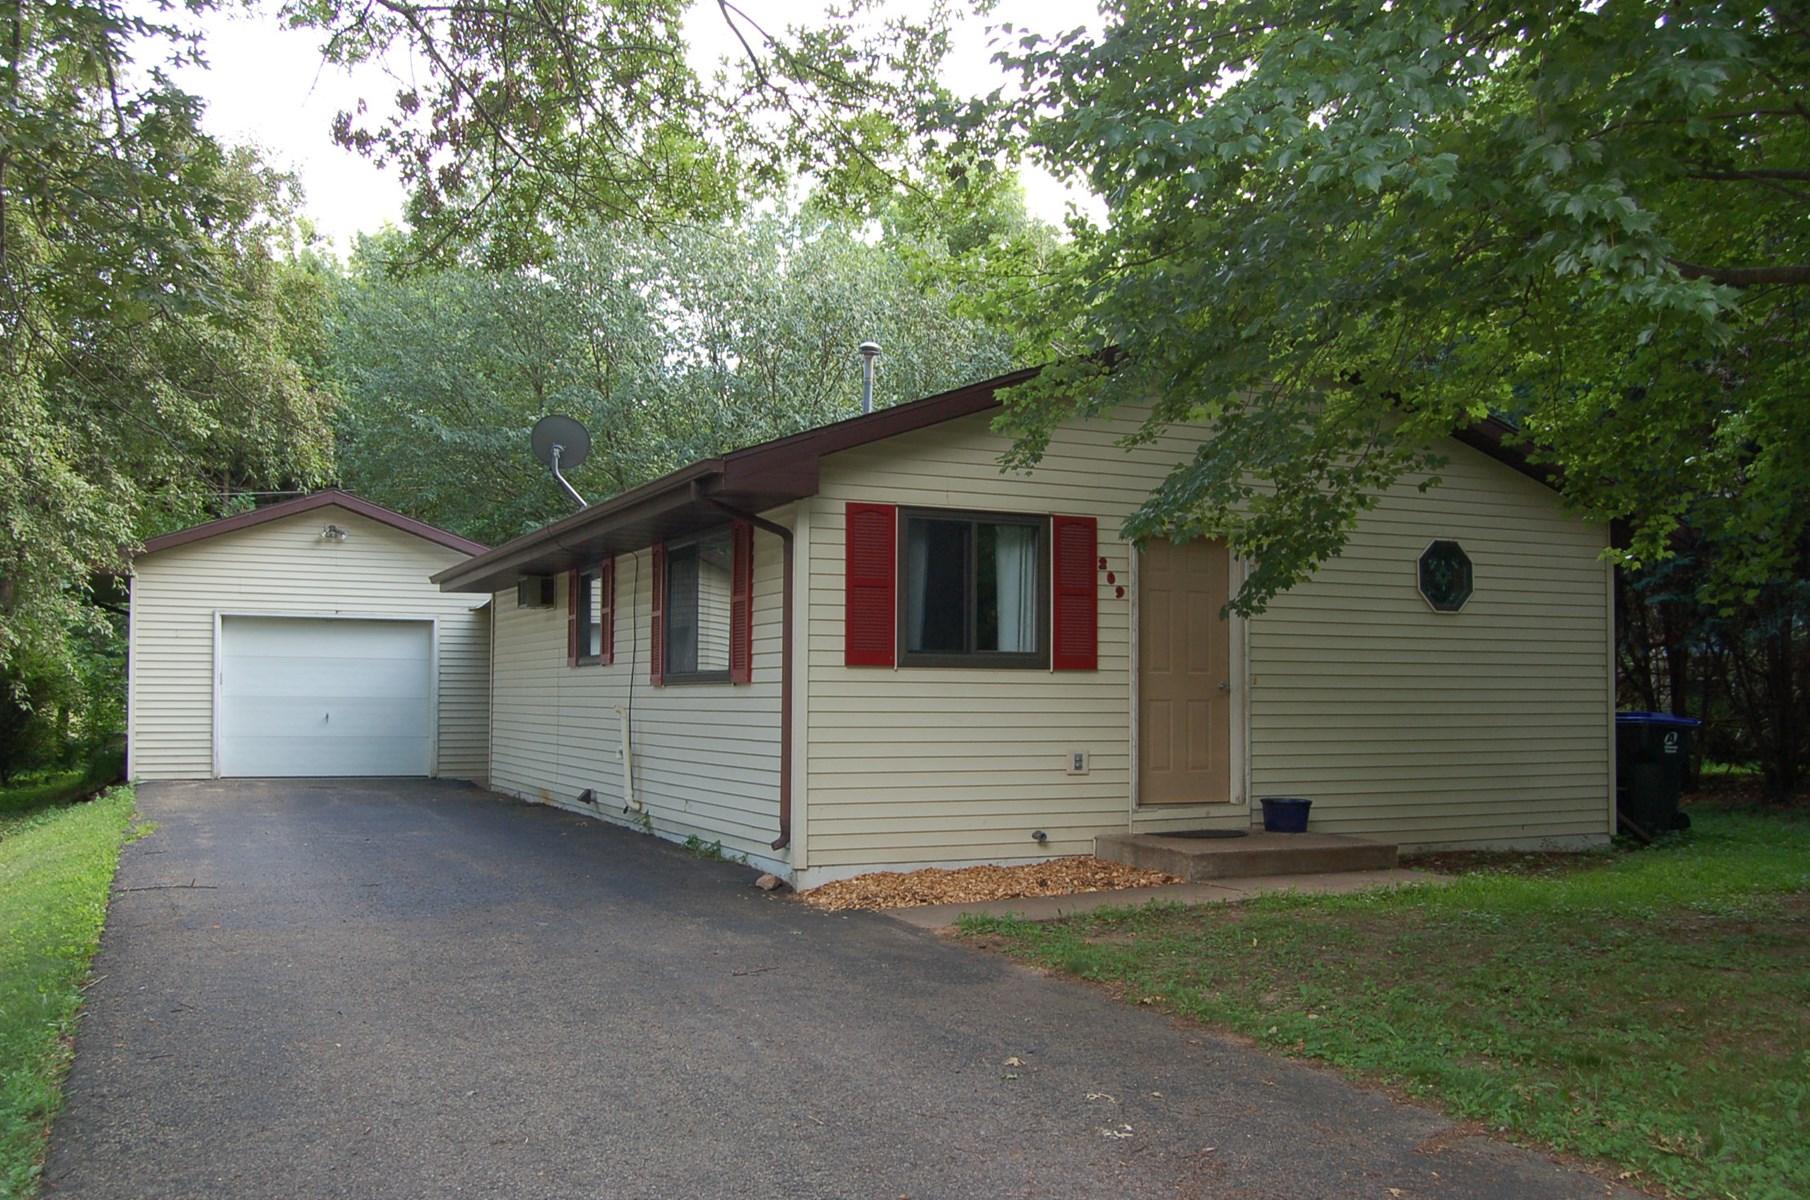 Home for Sale in Weyauwega, Waupaca County, WI